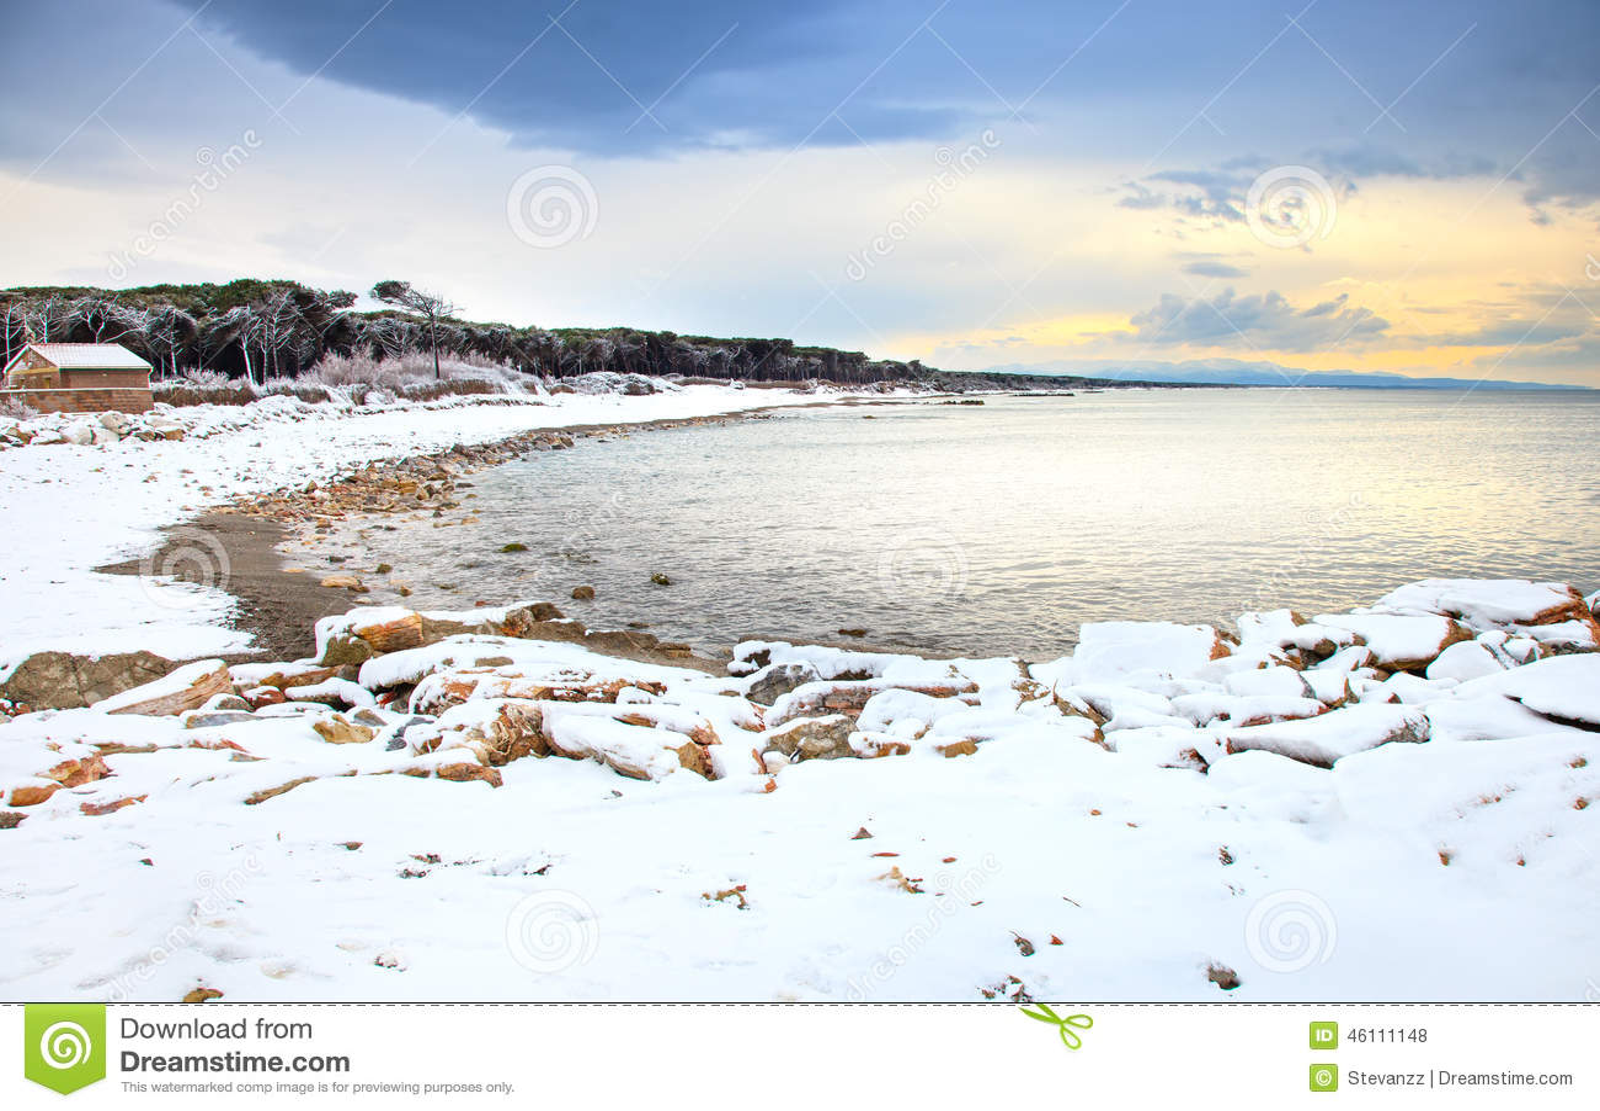 snow winter seasons sea - photo #48